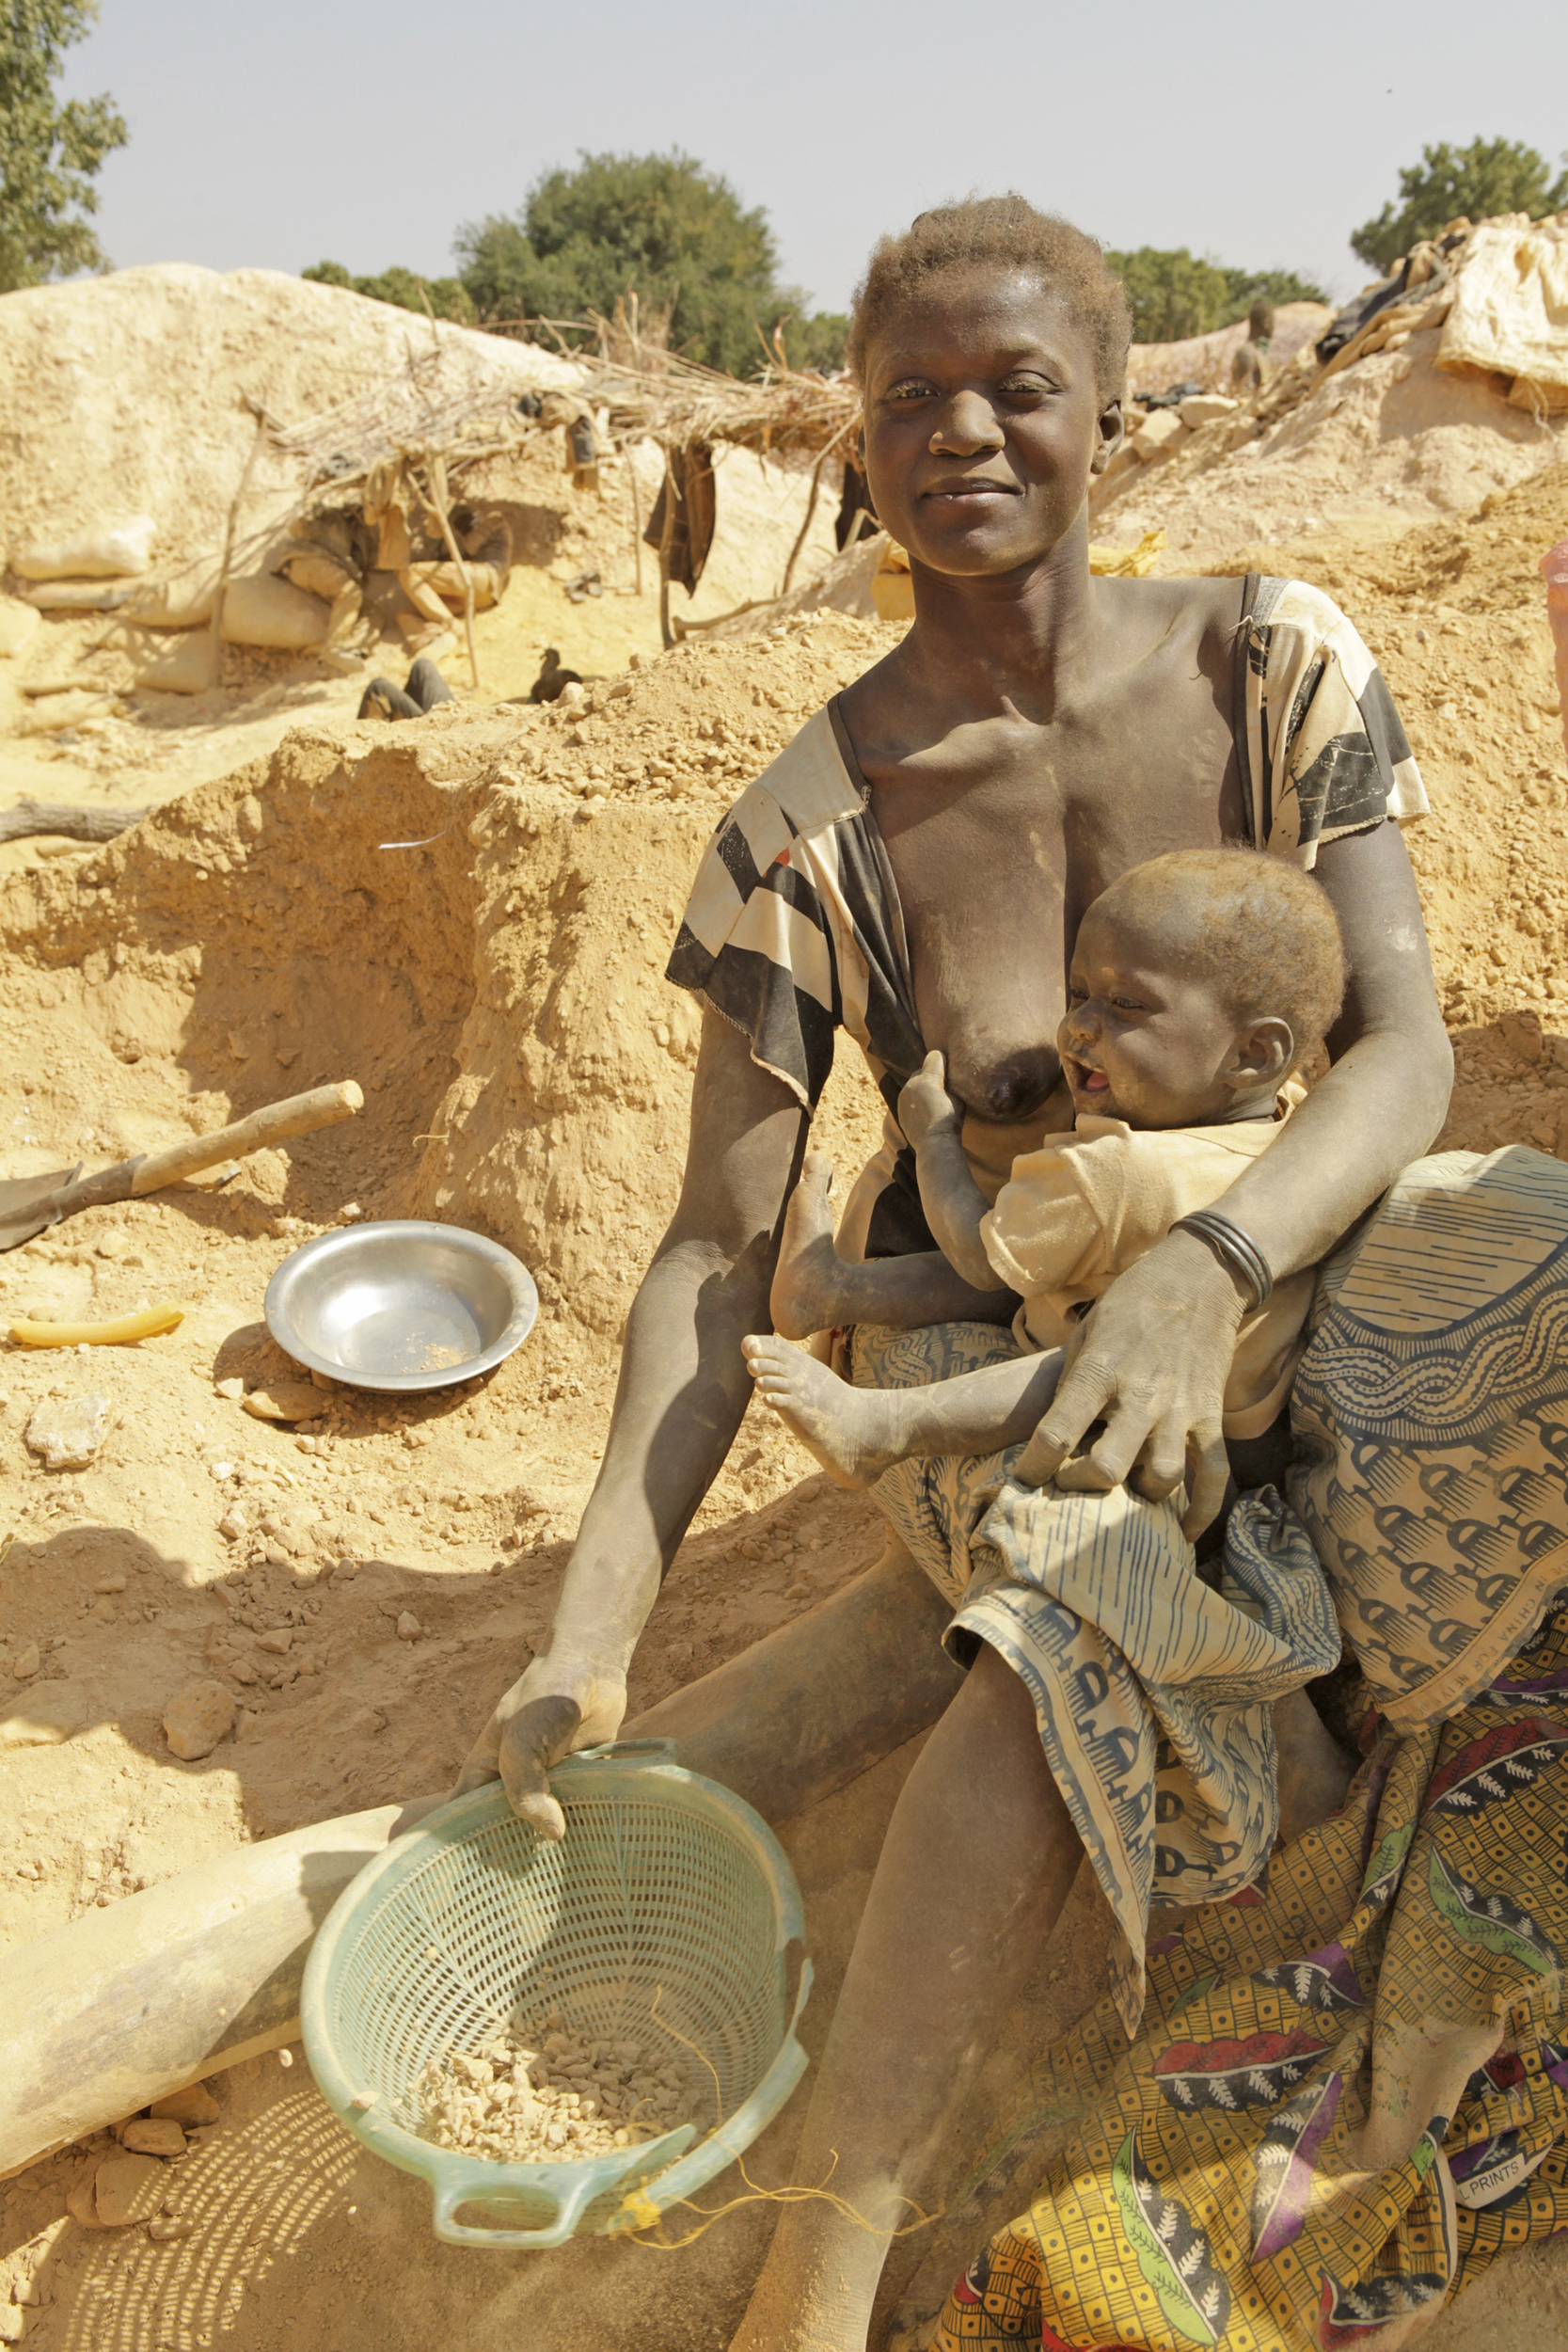 Processing Ore, Burkina Faso, 2010